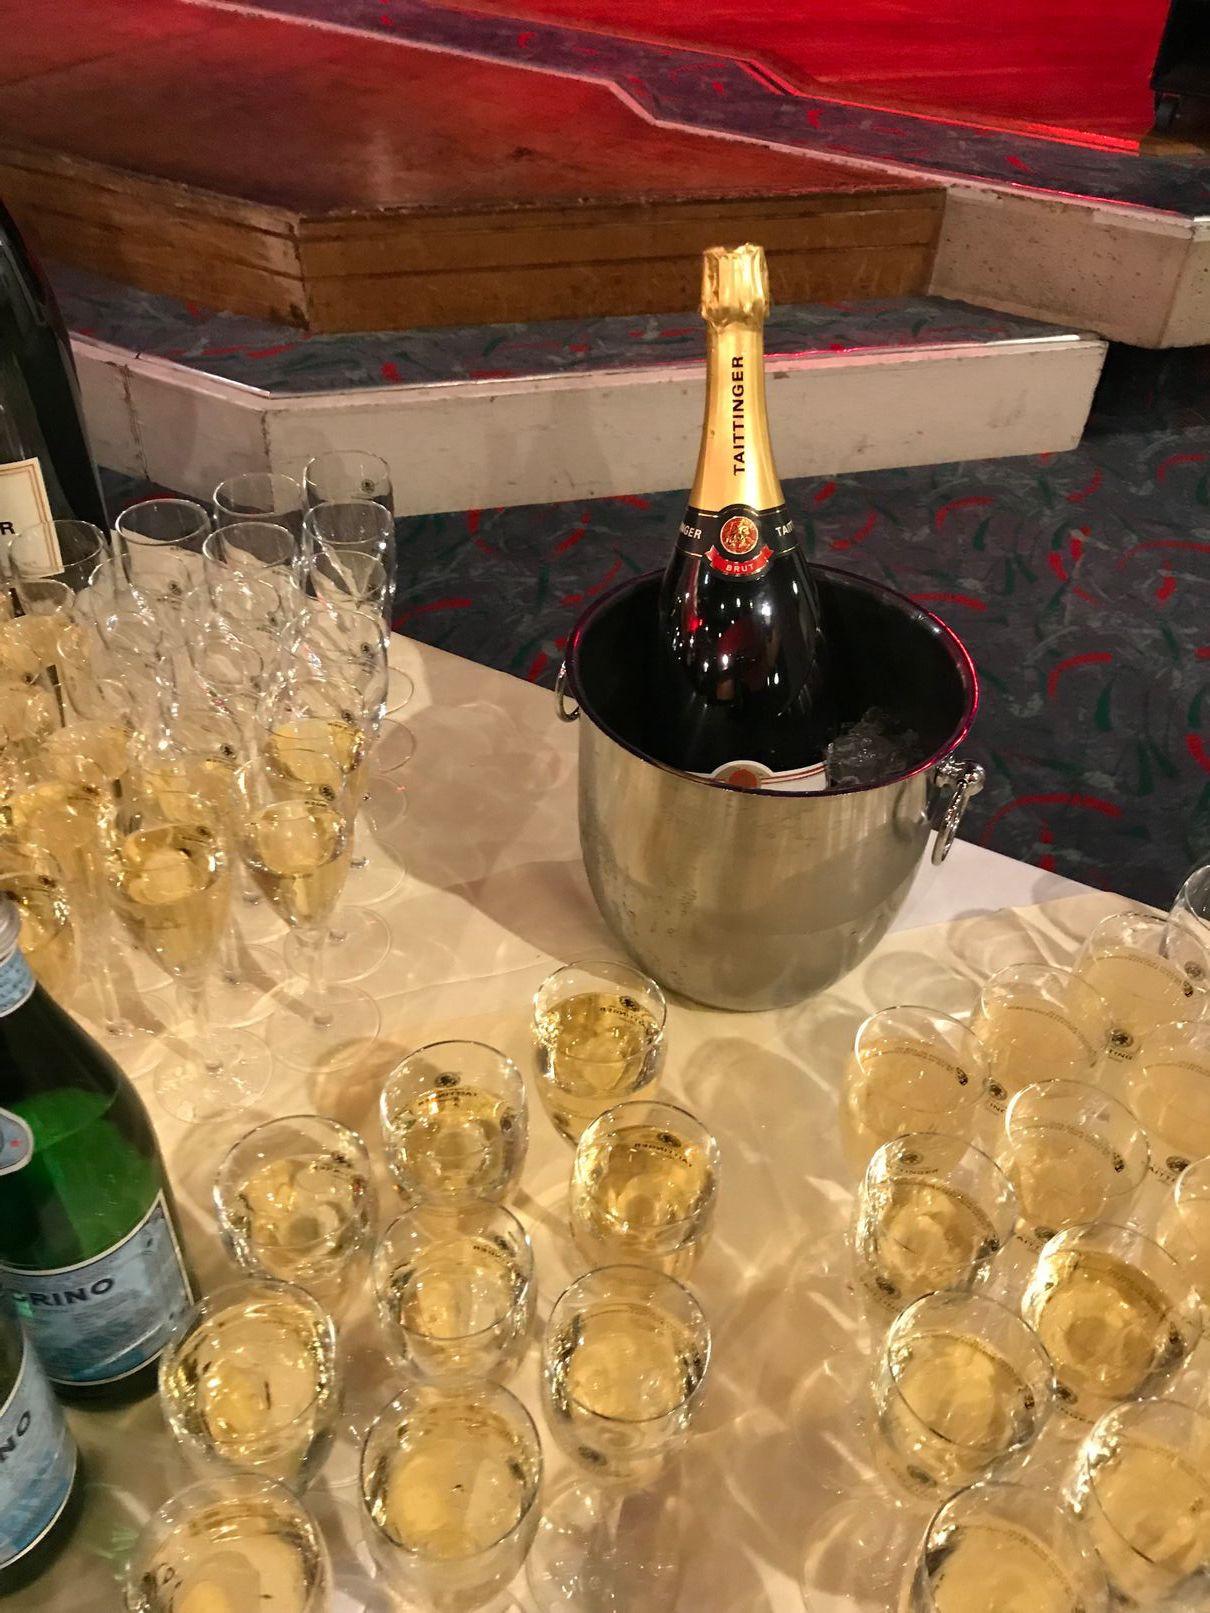 Taitinger Champagne reception at Bafta Cymru 2018